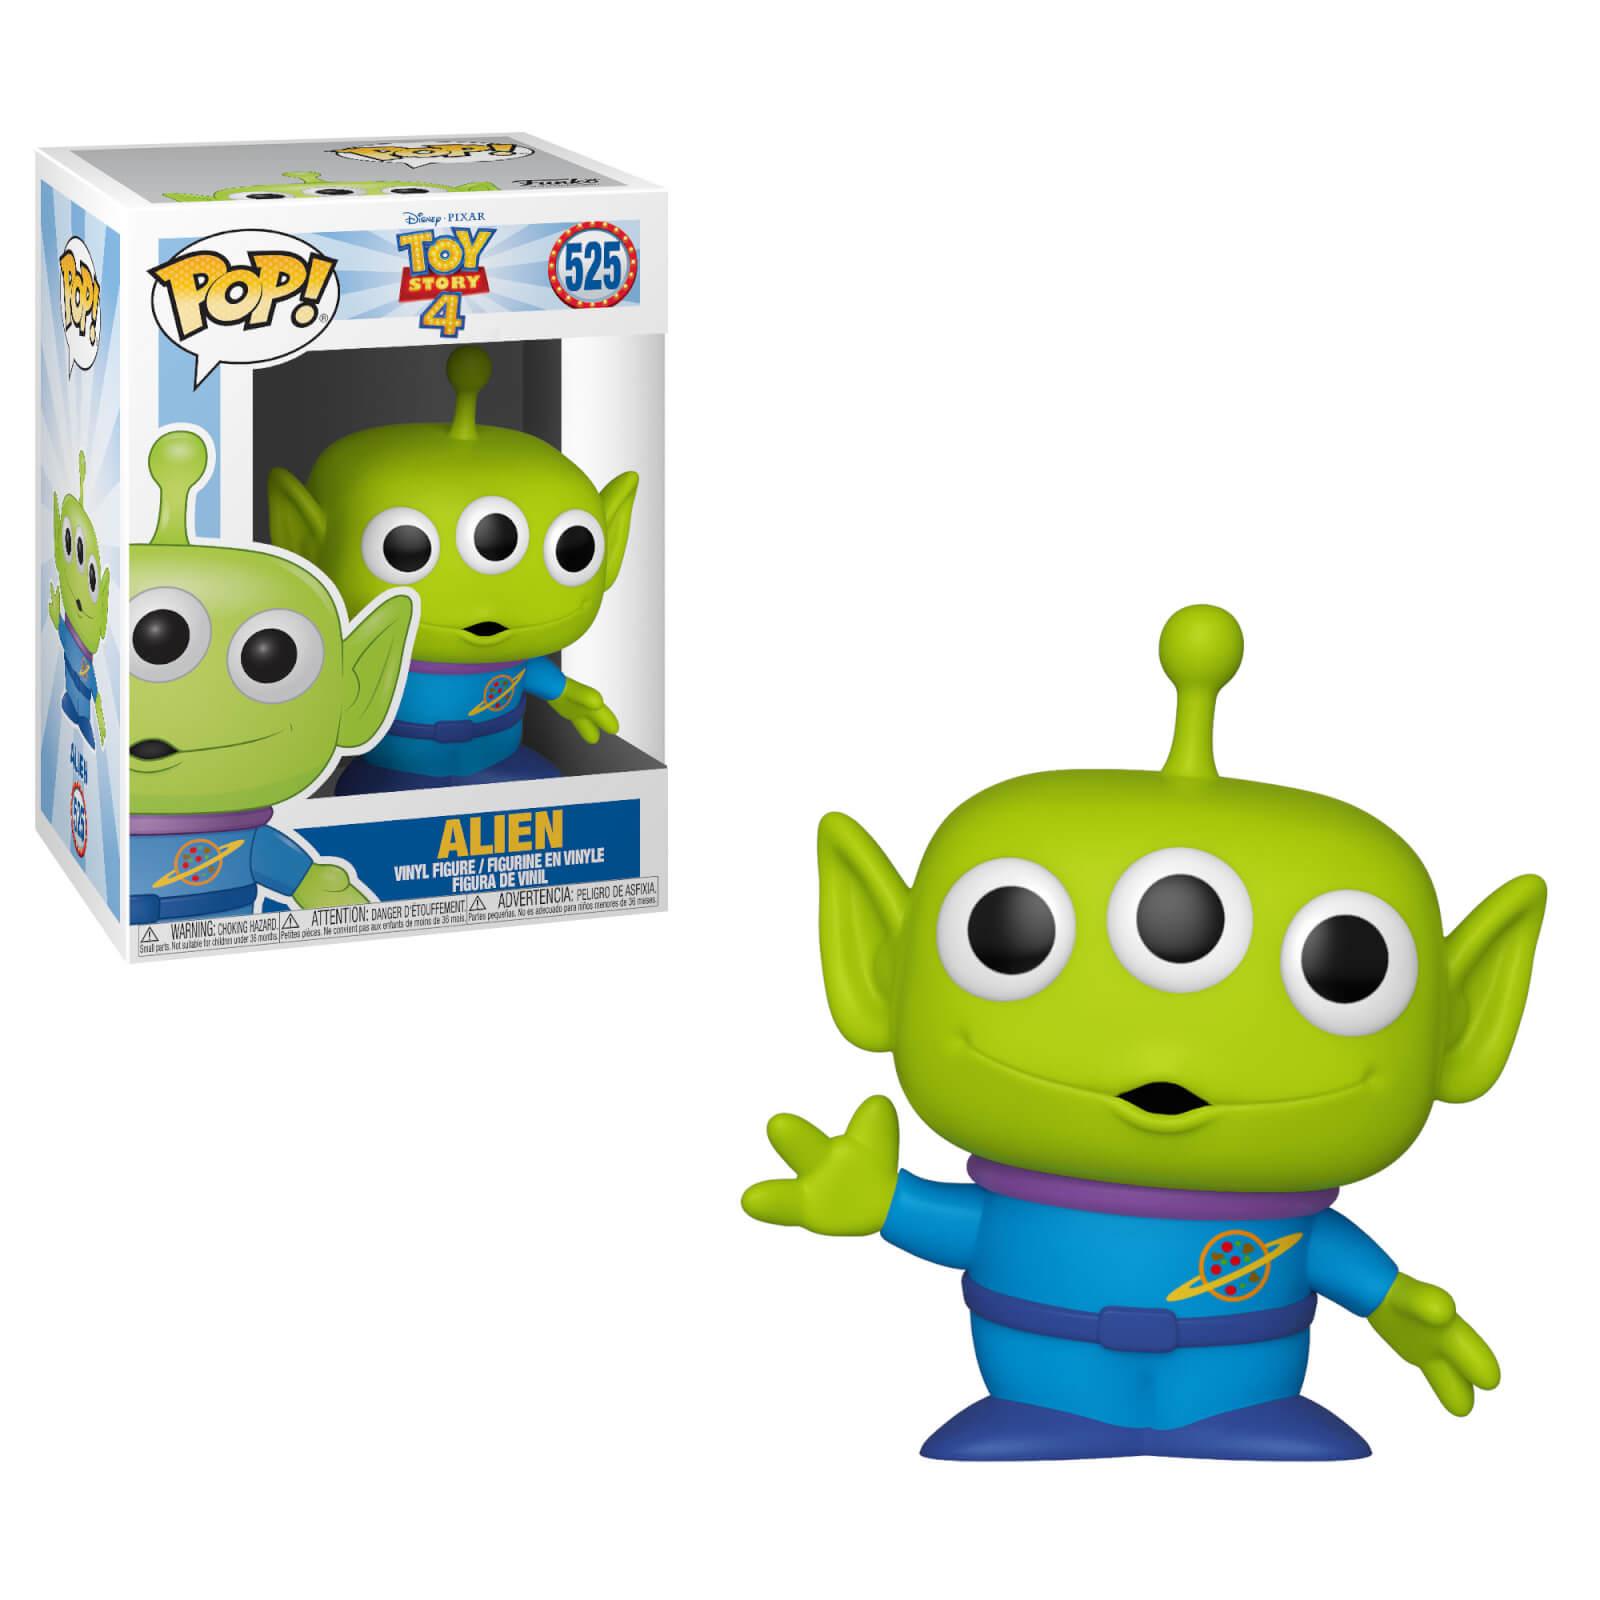 POP! Disney Pixar Toy Story 4: Alien